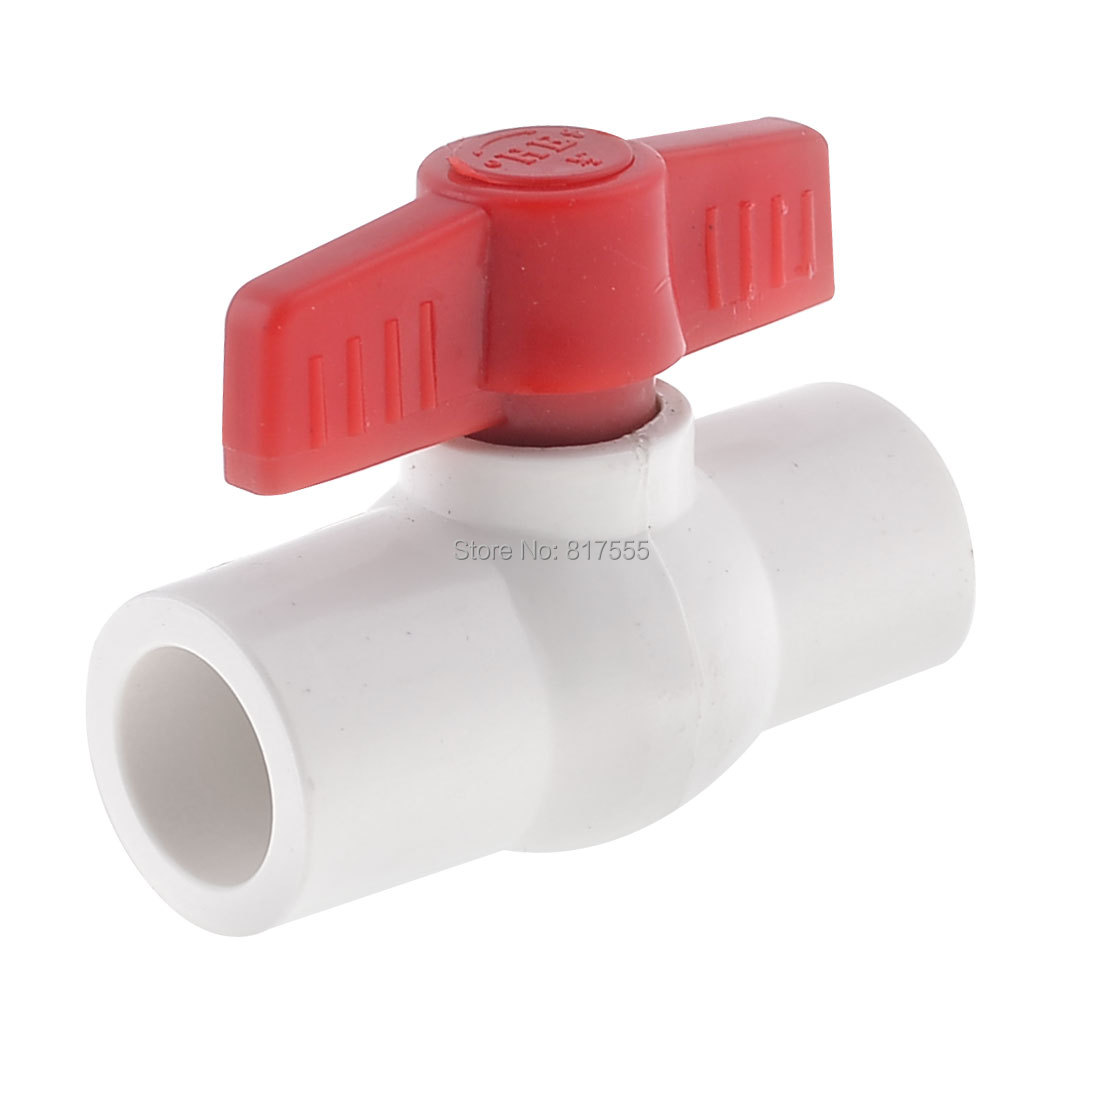 2 Inch Plumbing Pipe Formufit 1 2 In X 5 Ft Furniture